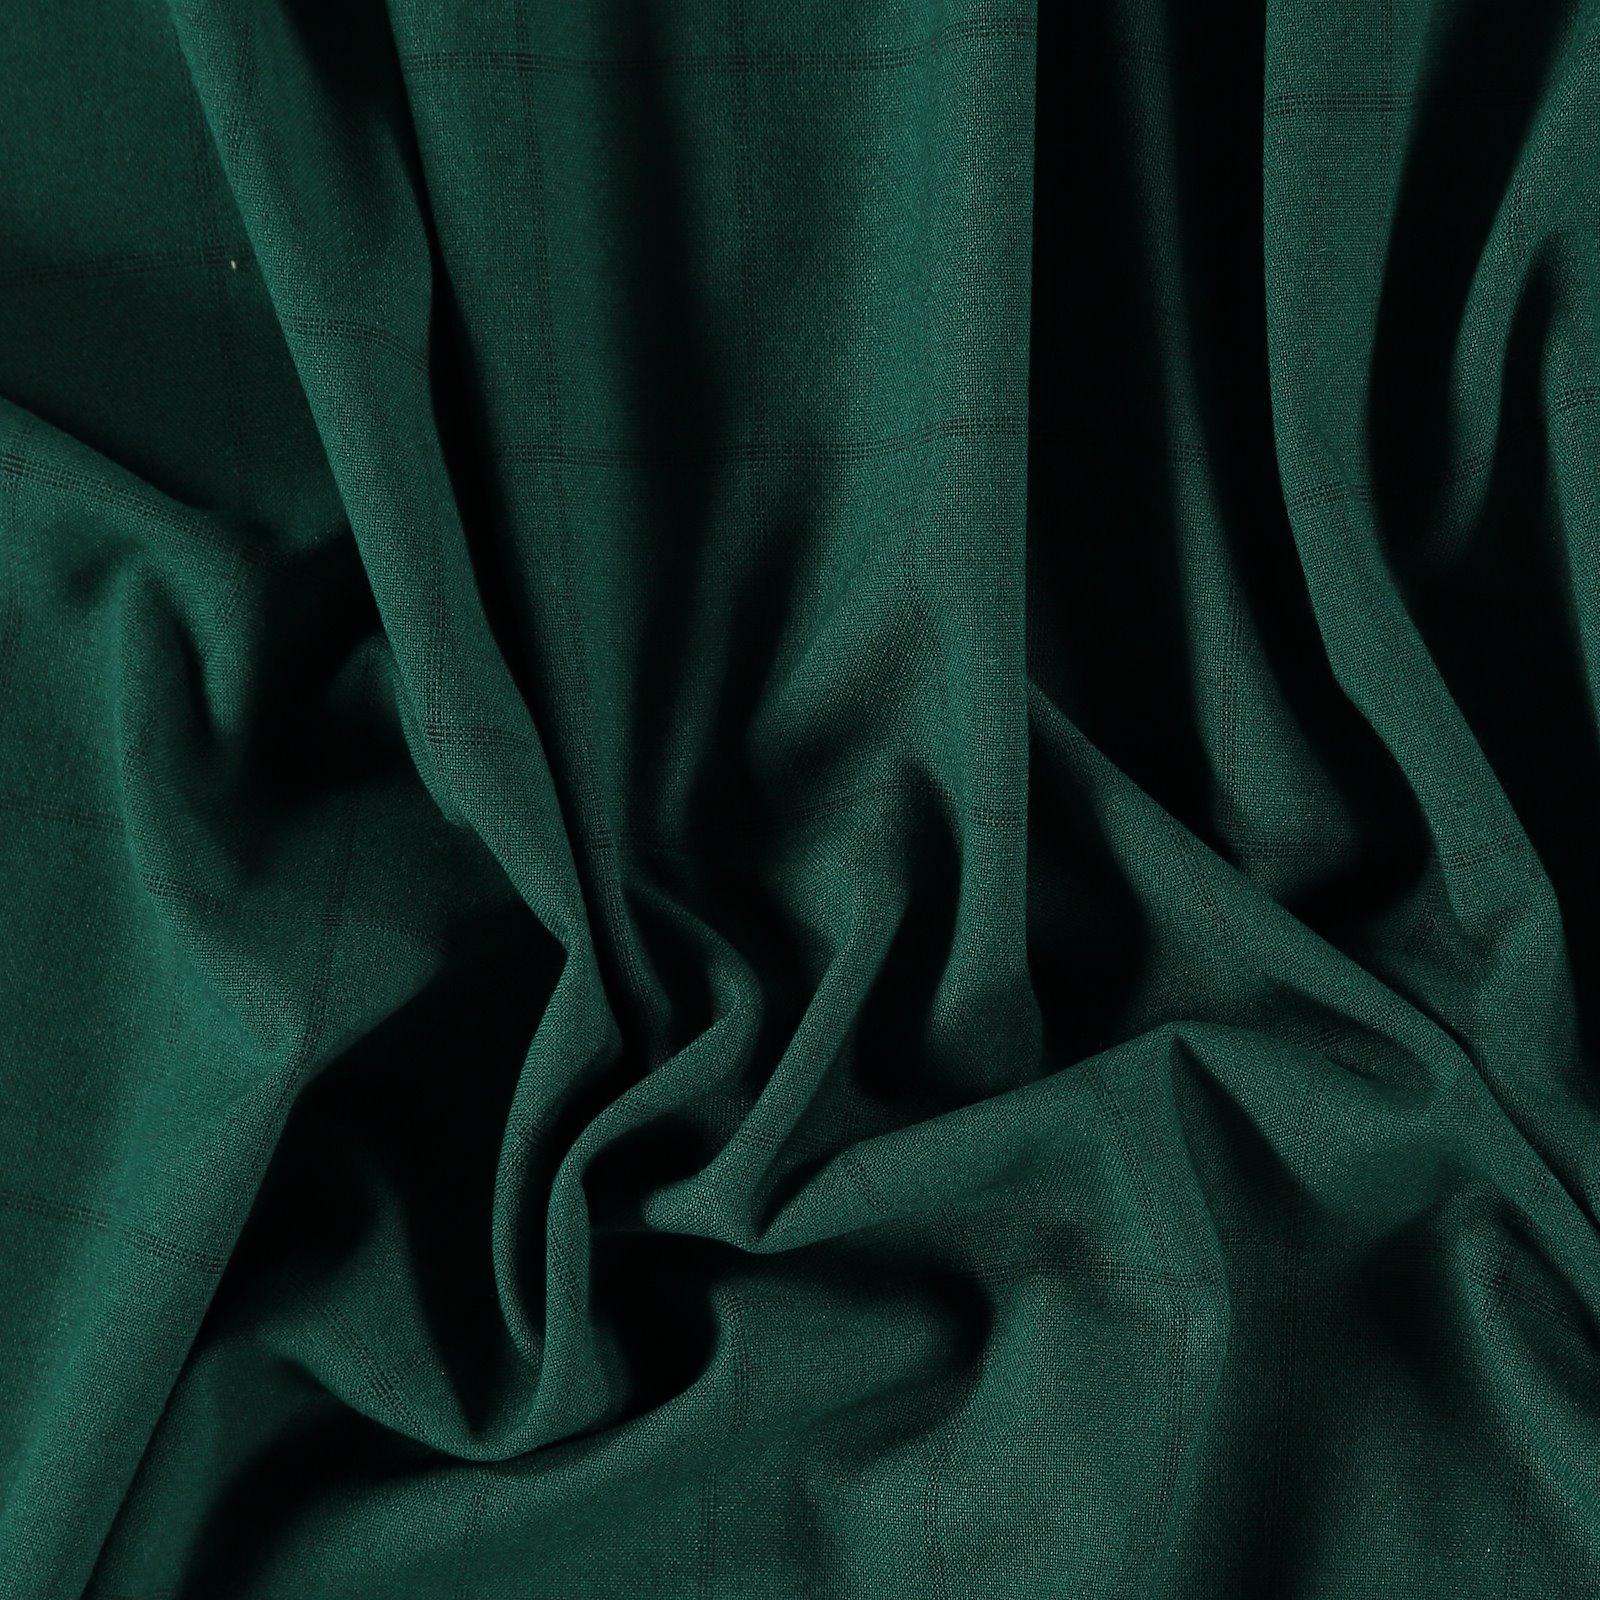 Woven dark green check